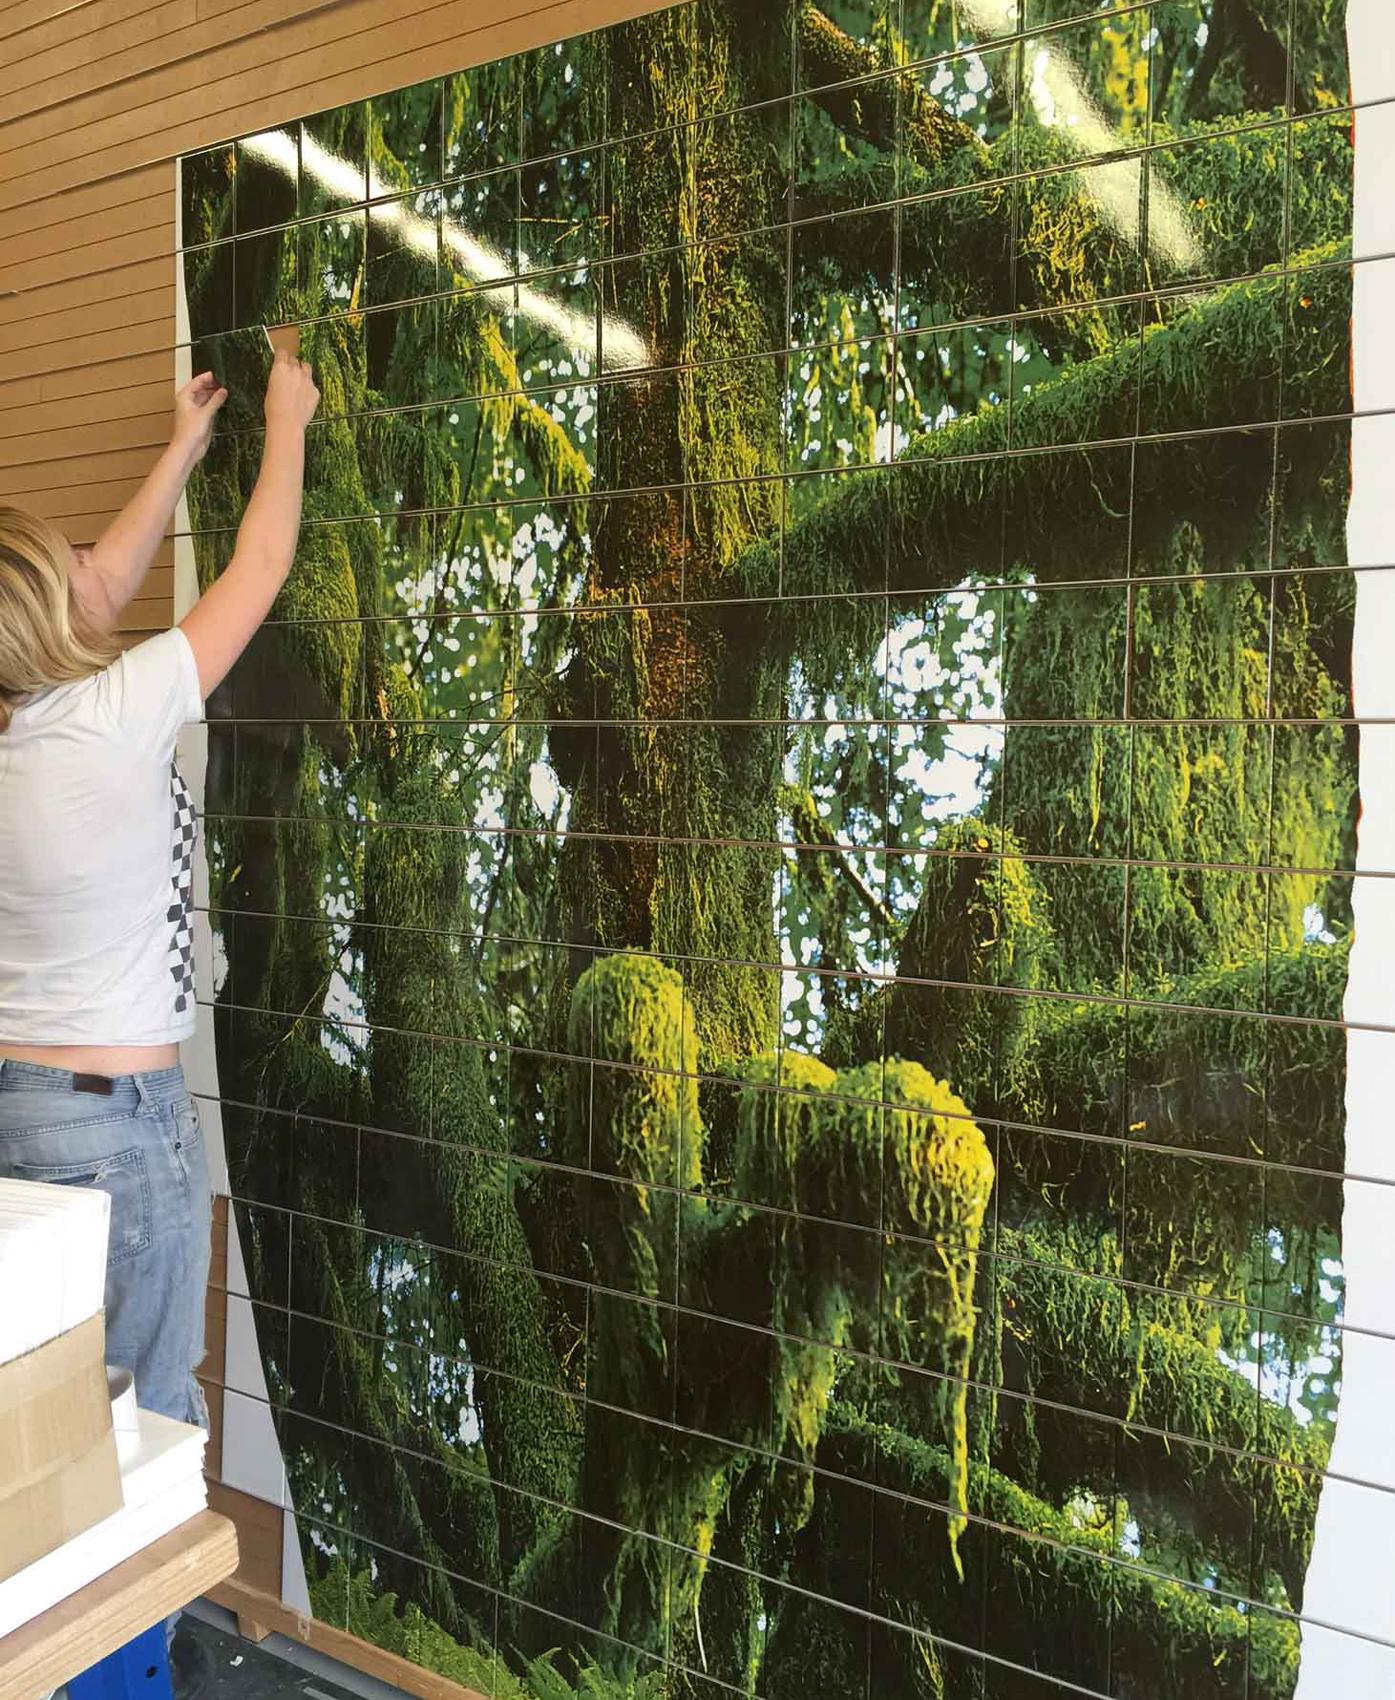 Outdoor Public Art Custom Tile Mural Layout